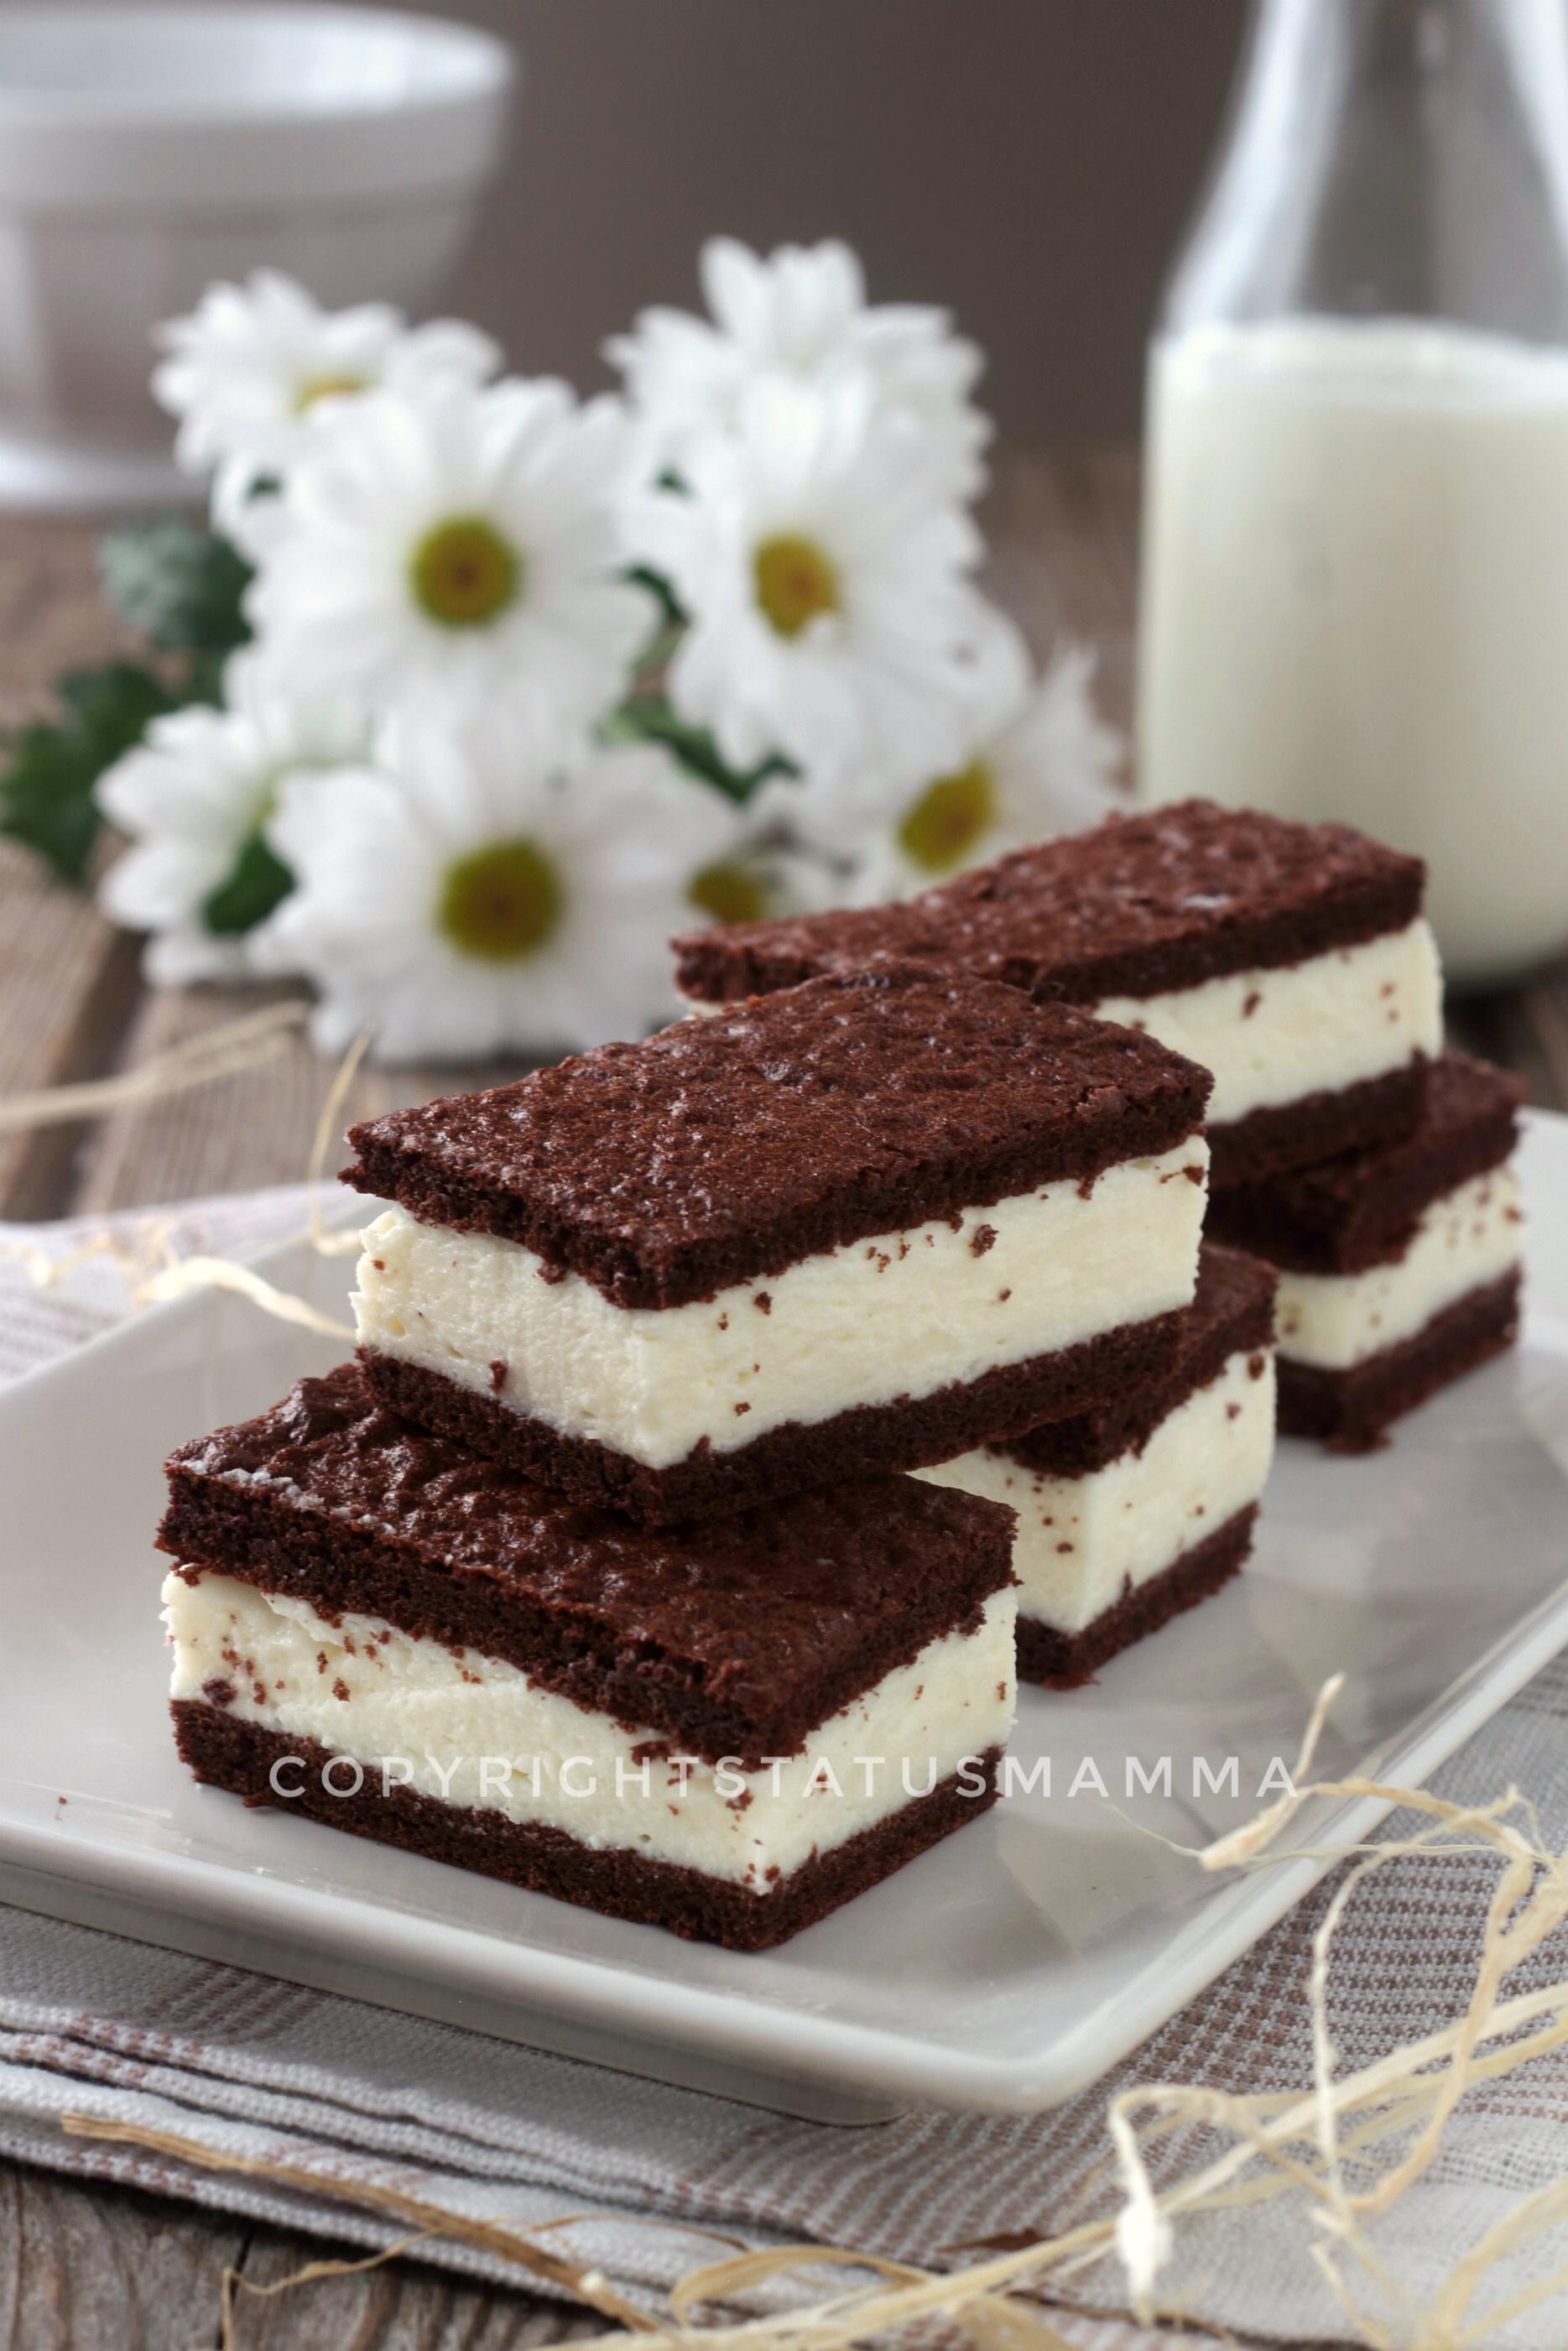 Merendine al cacao con crema semplice al latte